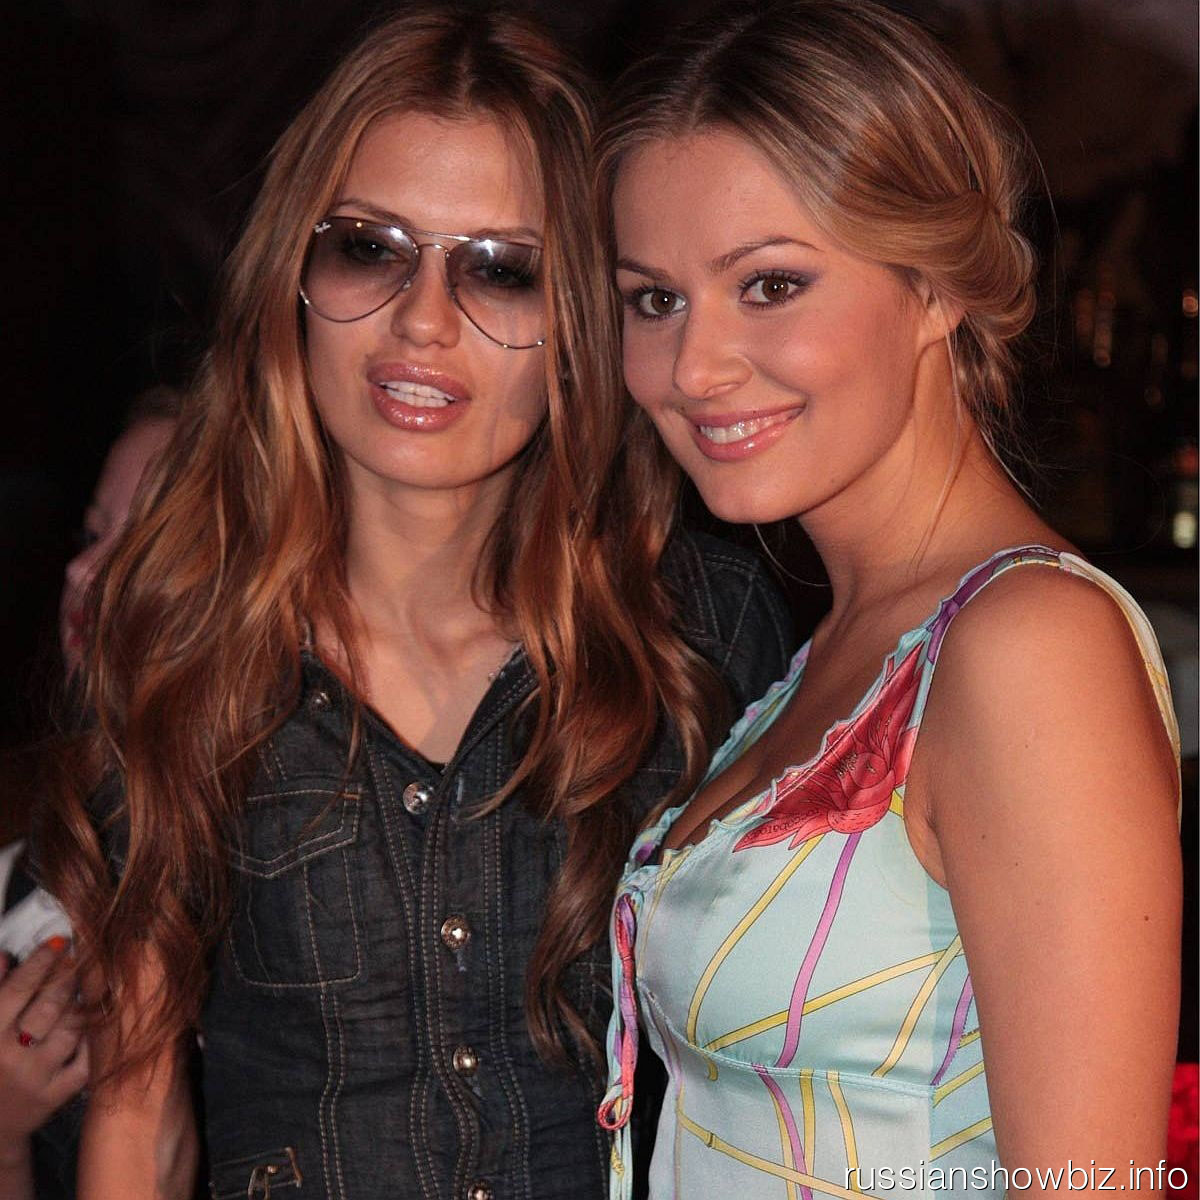 Виктория Боня и Мария Кожевникова